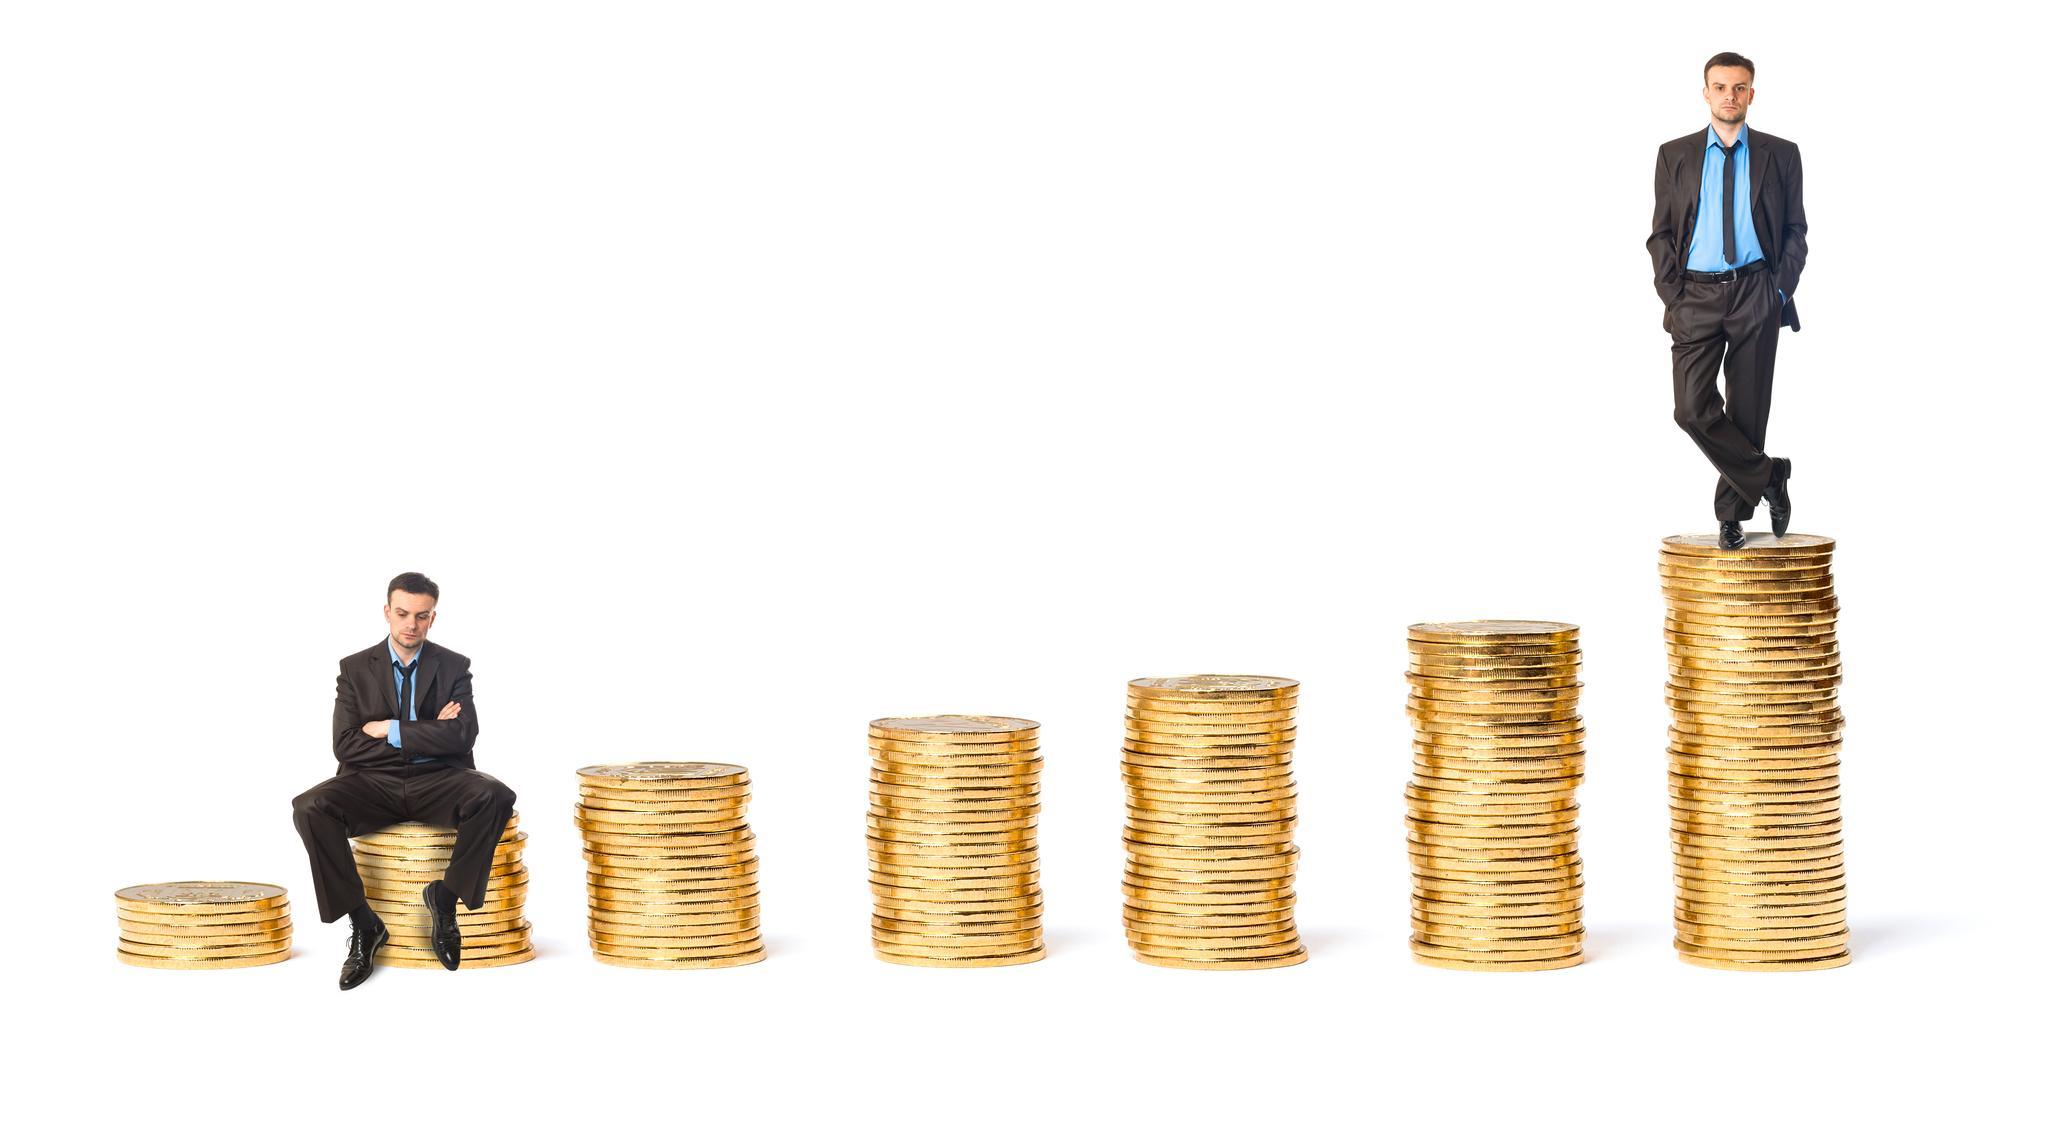 dgb en oecd minimum wages help the low paid colourbox